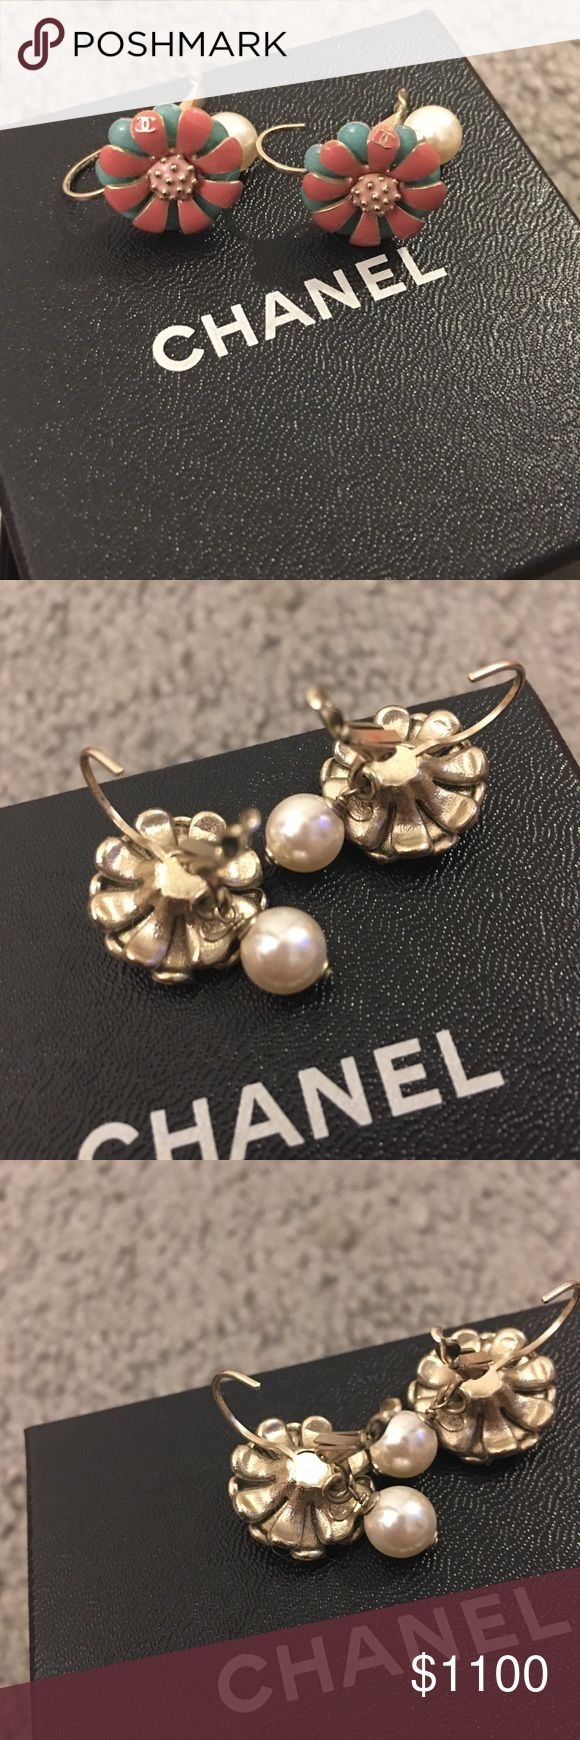 chanel earrings price. authentic chanel earrings (2017) bnwot price